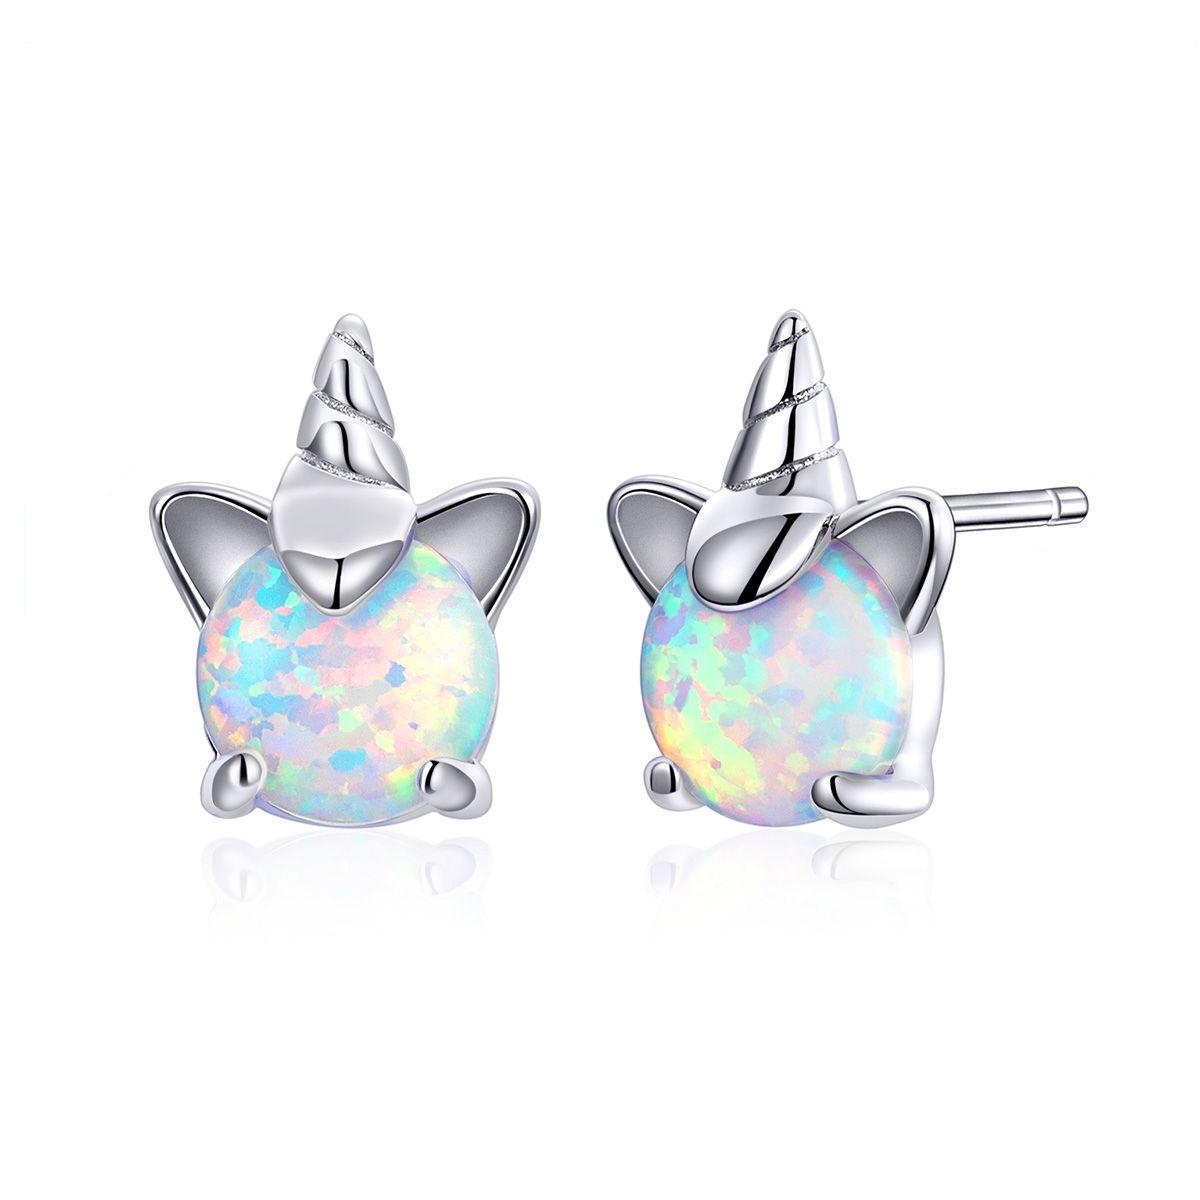 HQ 925 Sterling Silver White Opal bonito Licorne brincos de Moda Mulheres Belas Zircon jóias presente de aniversário do acoplamento do casamento menina